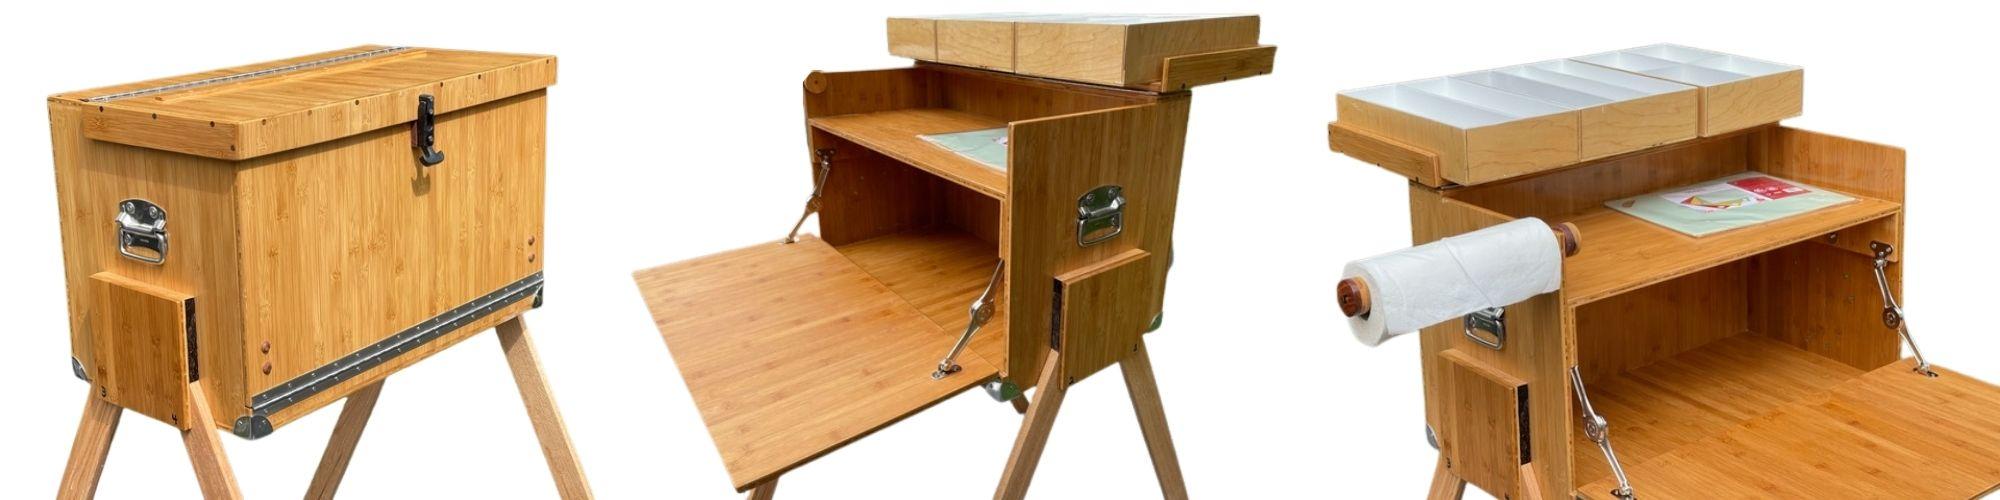 bamboo-plywood-cookbox-customer-creations